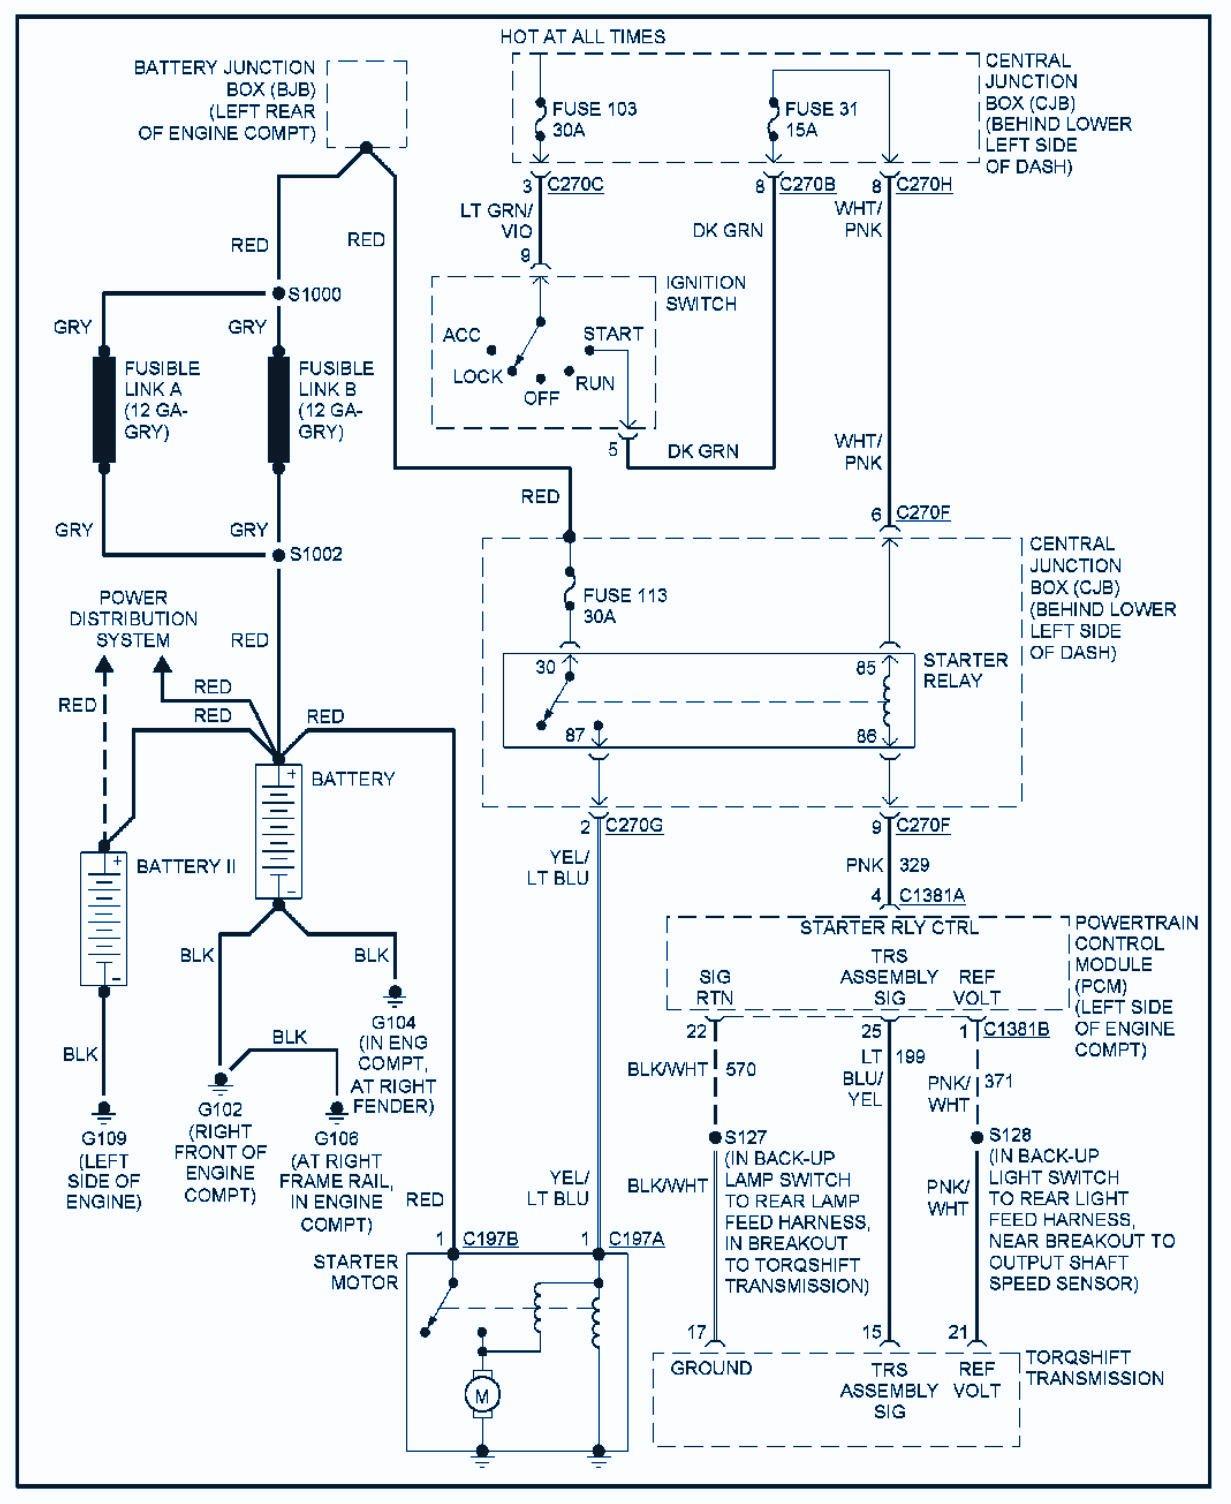 Wiring Diagrams 2000 F 550 Reinvent Your Diagram 2008 F250 Fog Light F550 For 08 Schematics U2022 Rh Parntesis Co Ford